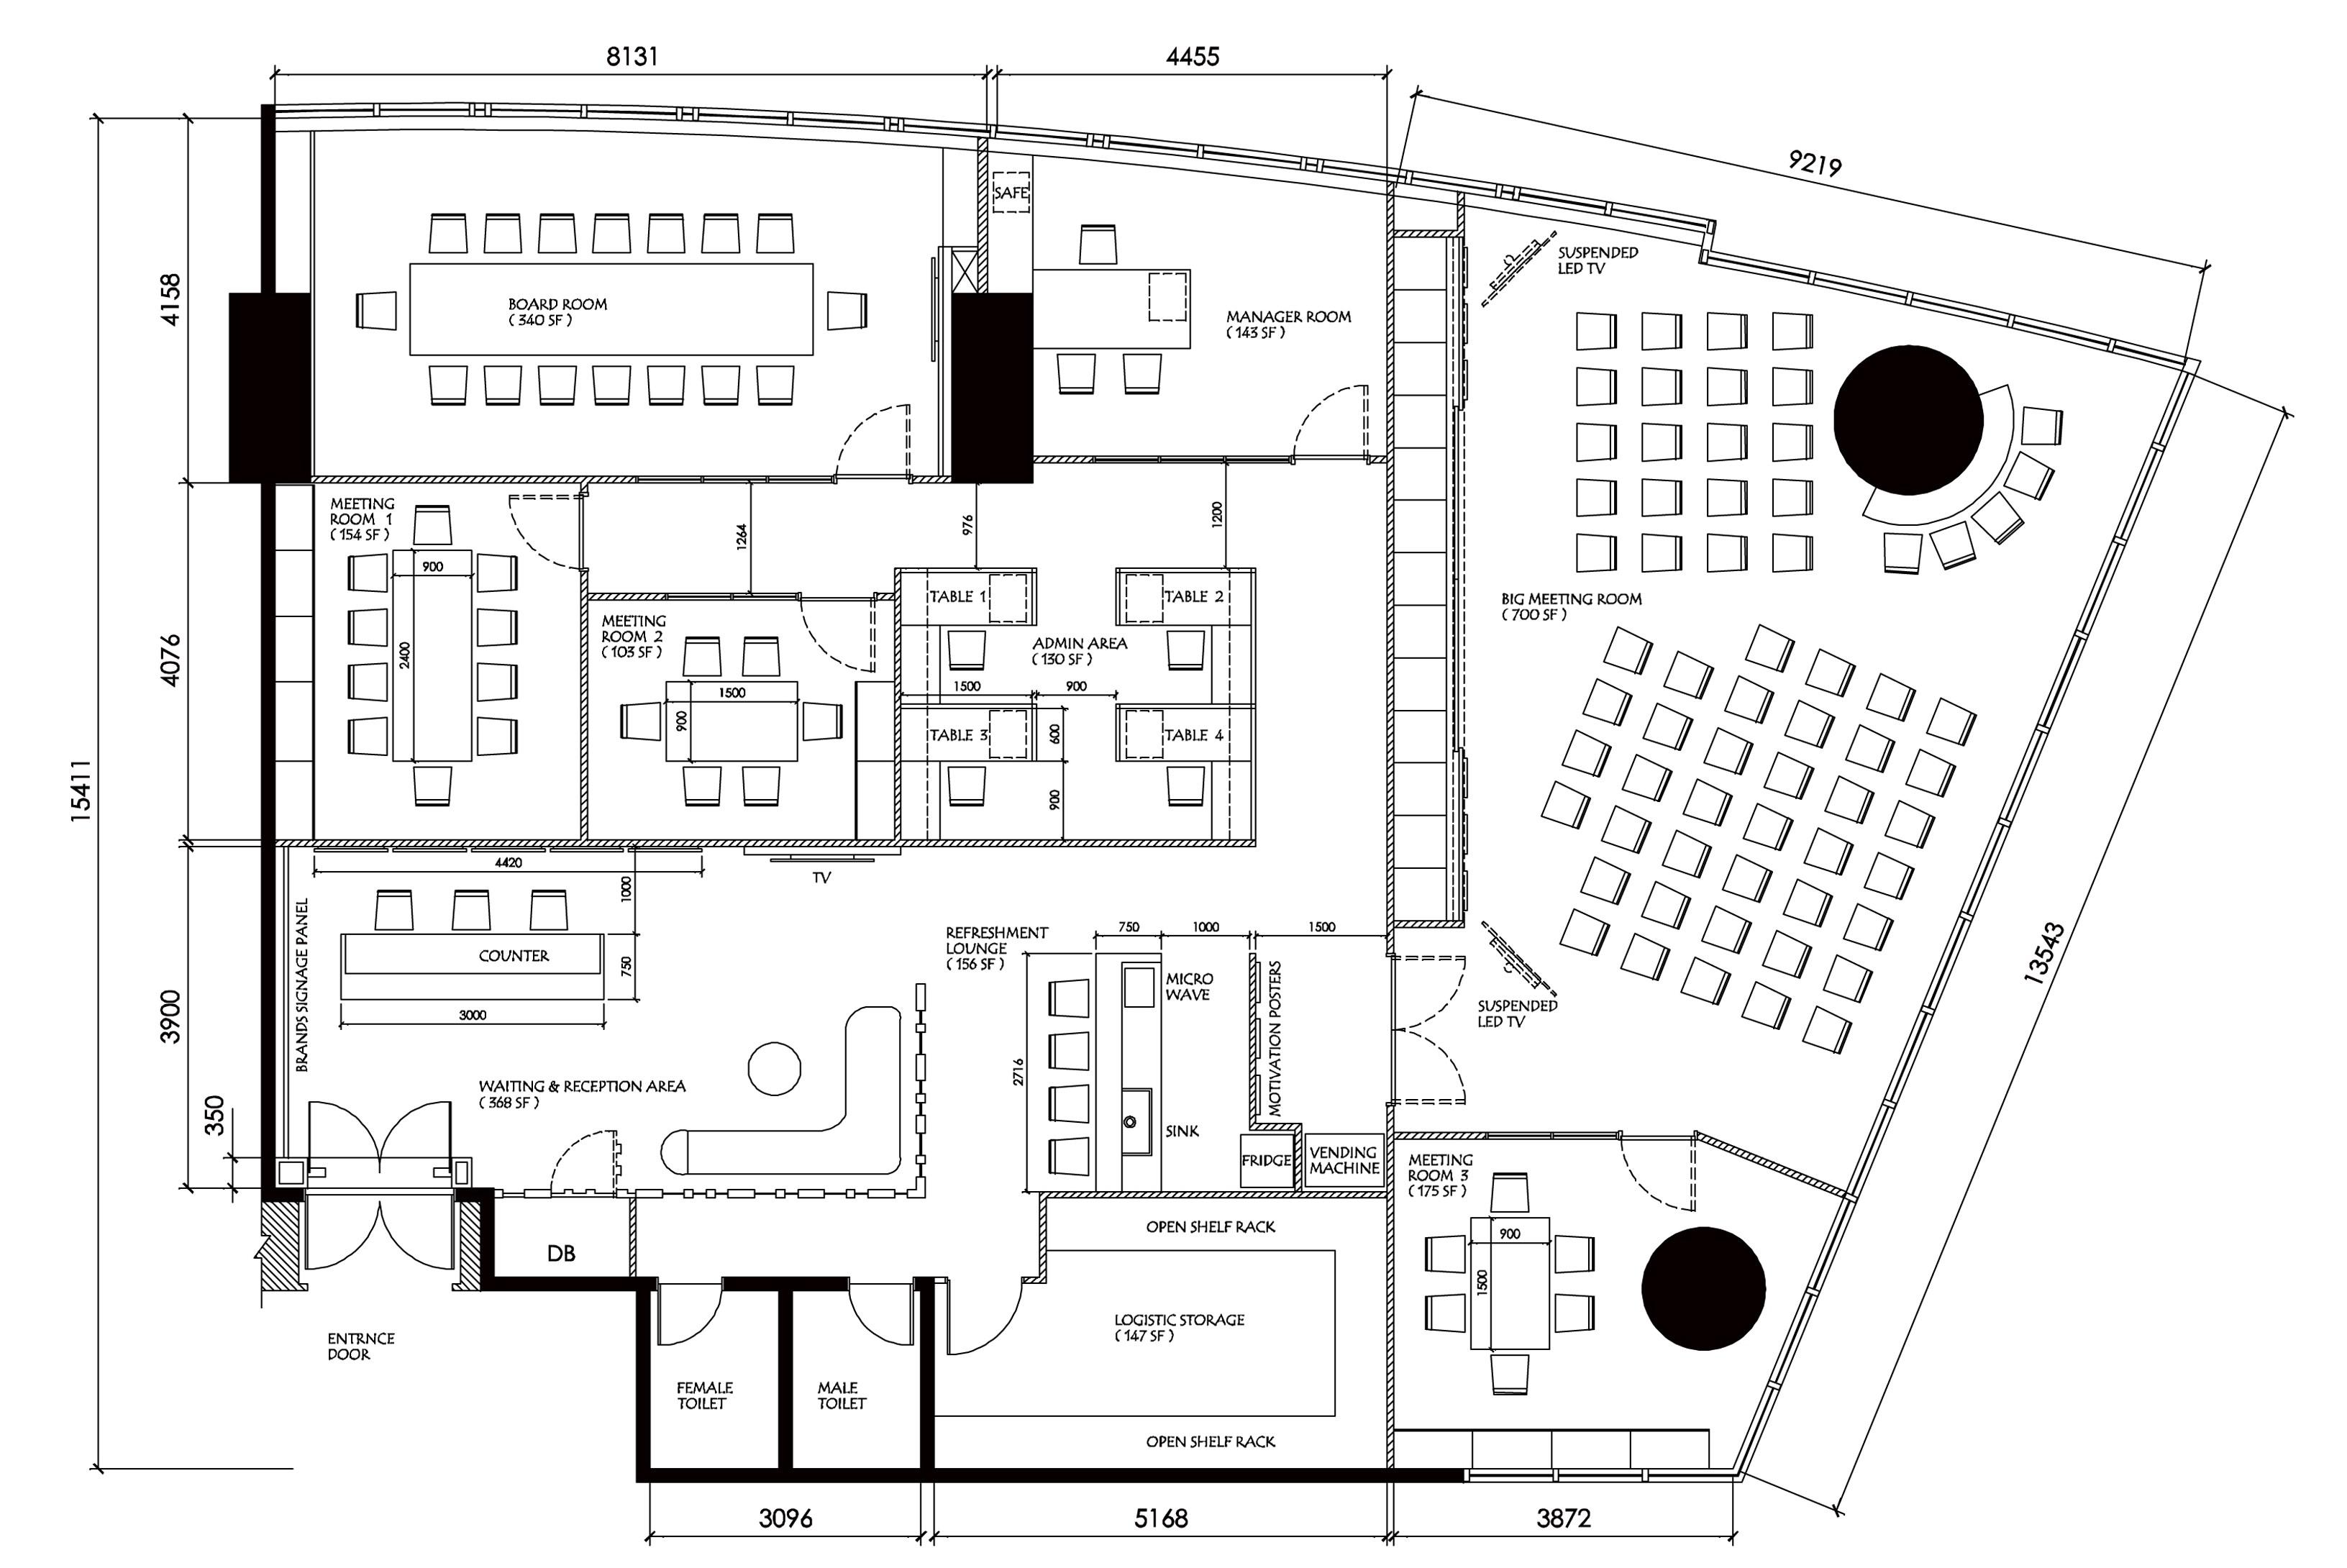 Furniture Layout Plan Fabron Design Interior Drawings Service Online